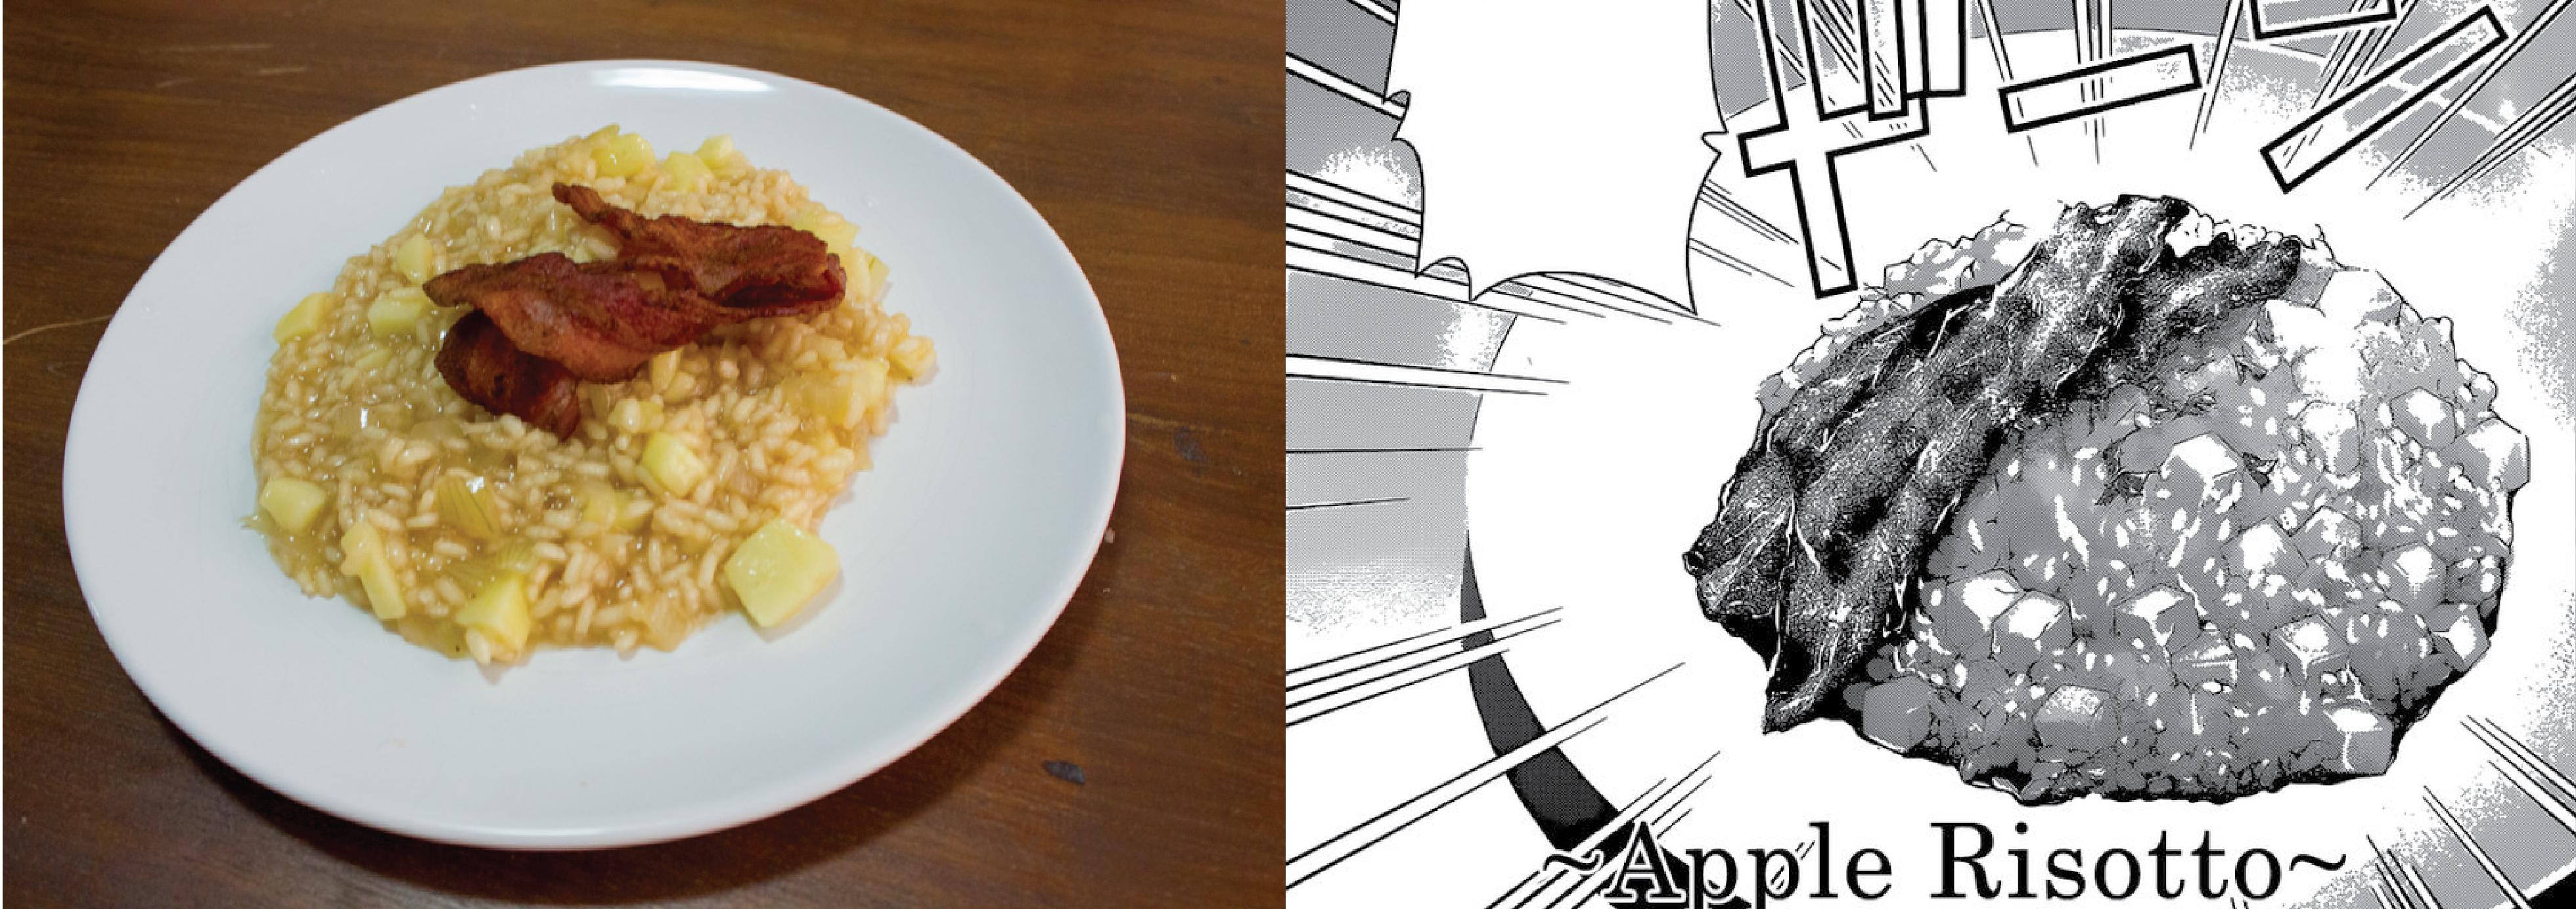 apple risotto manga recipe cheaptricks 360